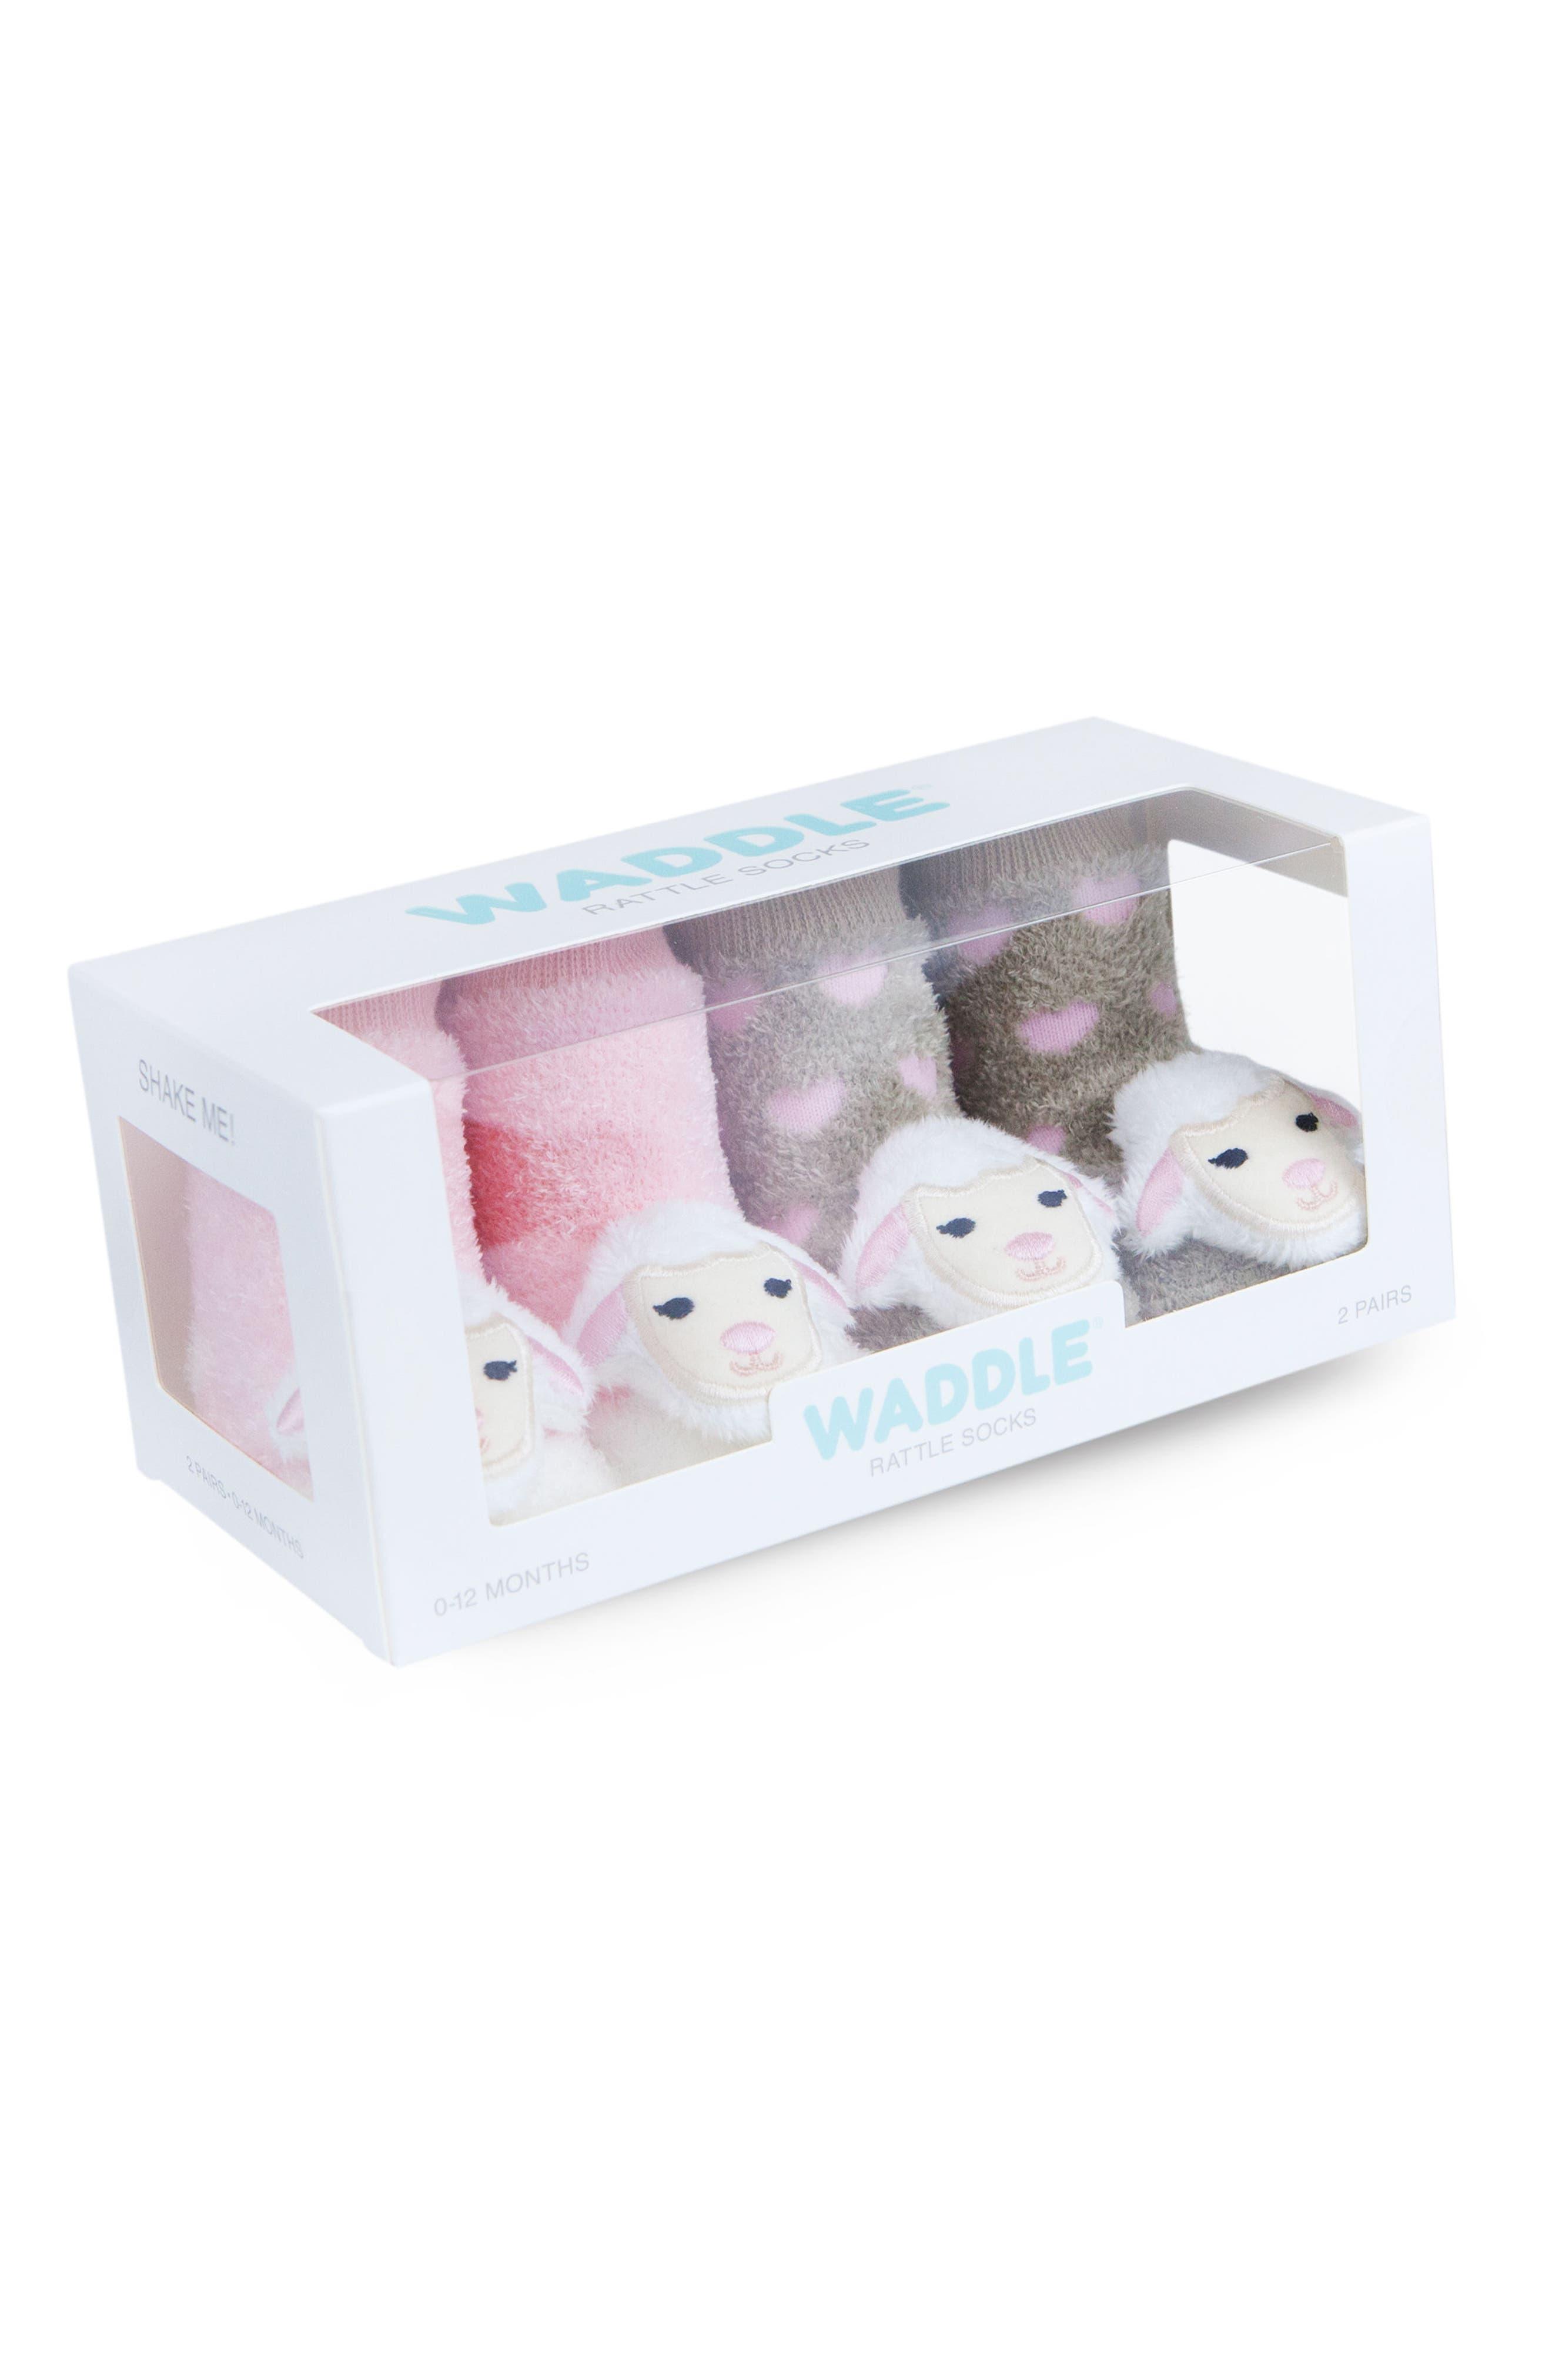 & Friends Lamb 2-Pack Rattle Socks,                             Alternate thumbnail 2, color,                             Pink/ Light Brown